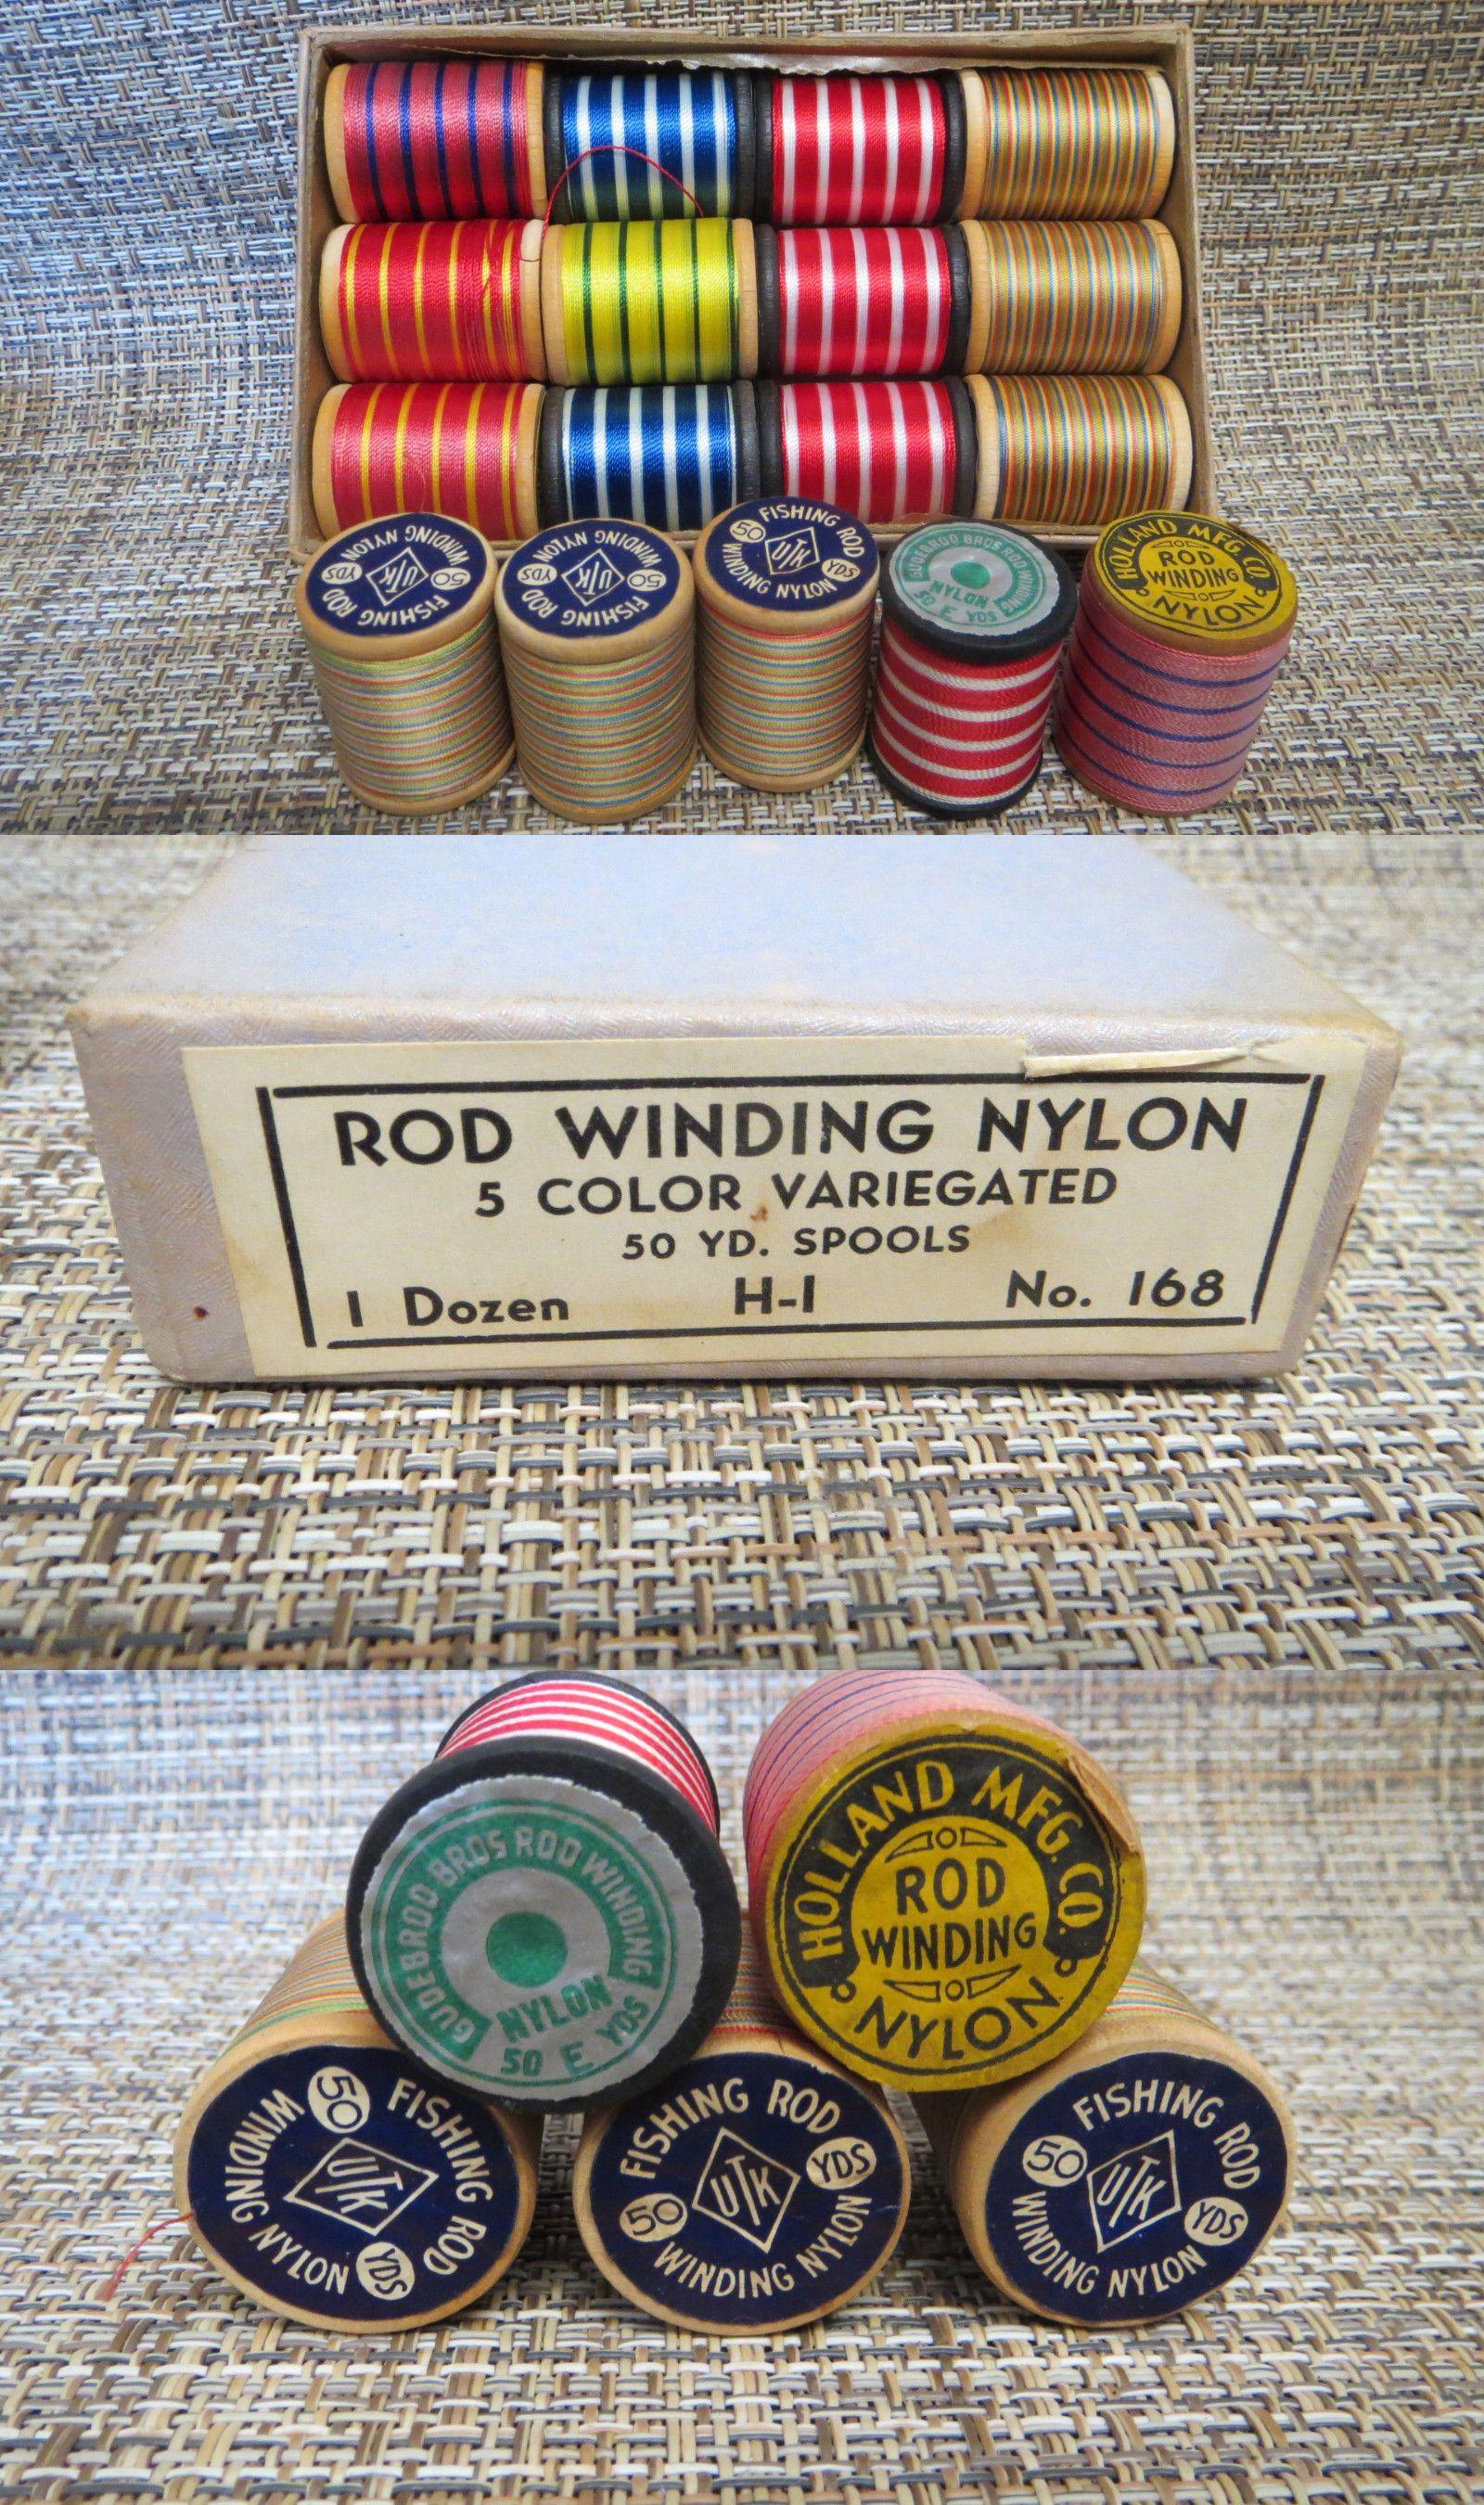 Thread epoxy and coatings 61252 17 spools gudebrod holland mixed thread epoxy and coatings 61252 17 spools gudebrod holland mixed colors nylon rod winding thread nvjuhfo Choice Image